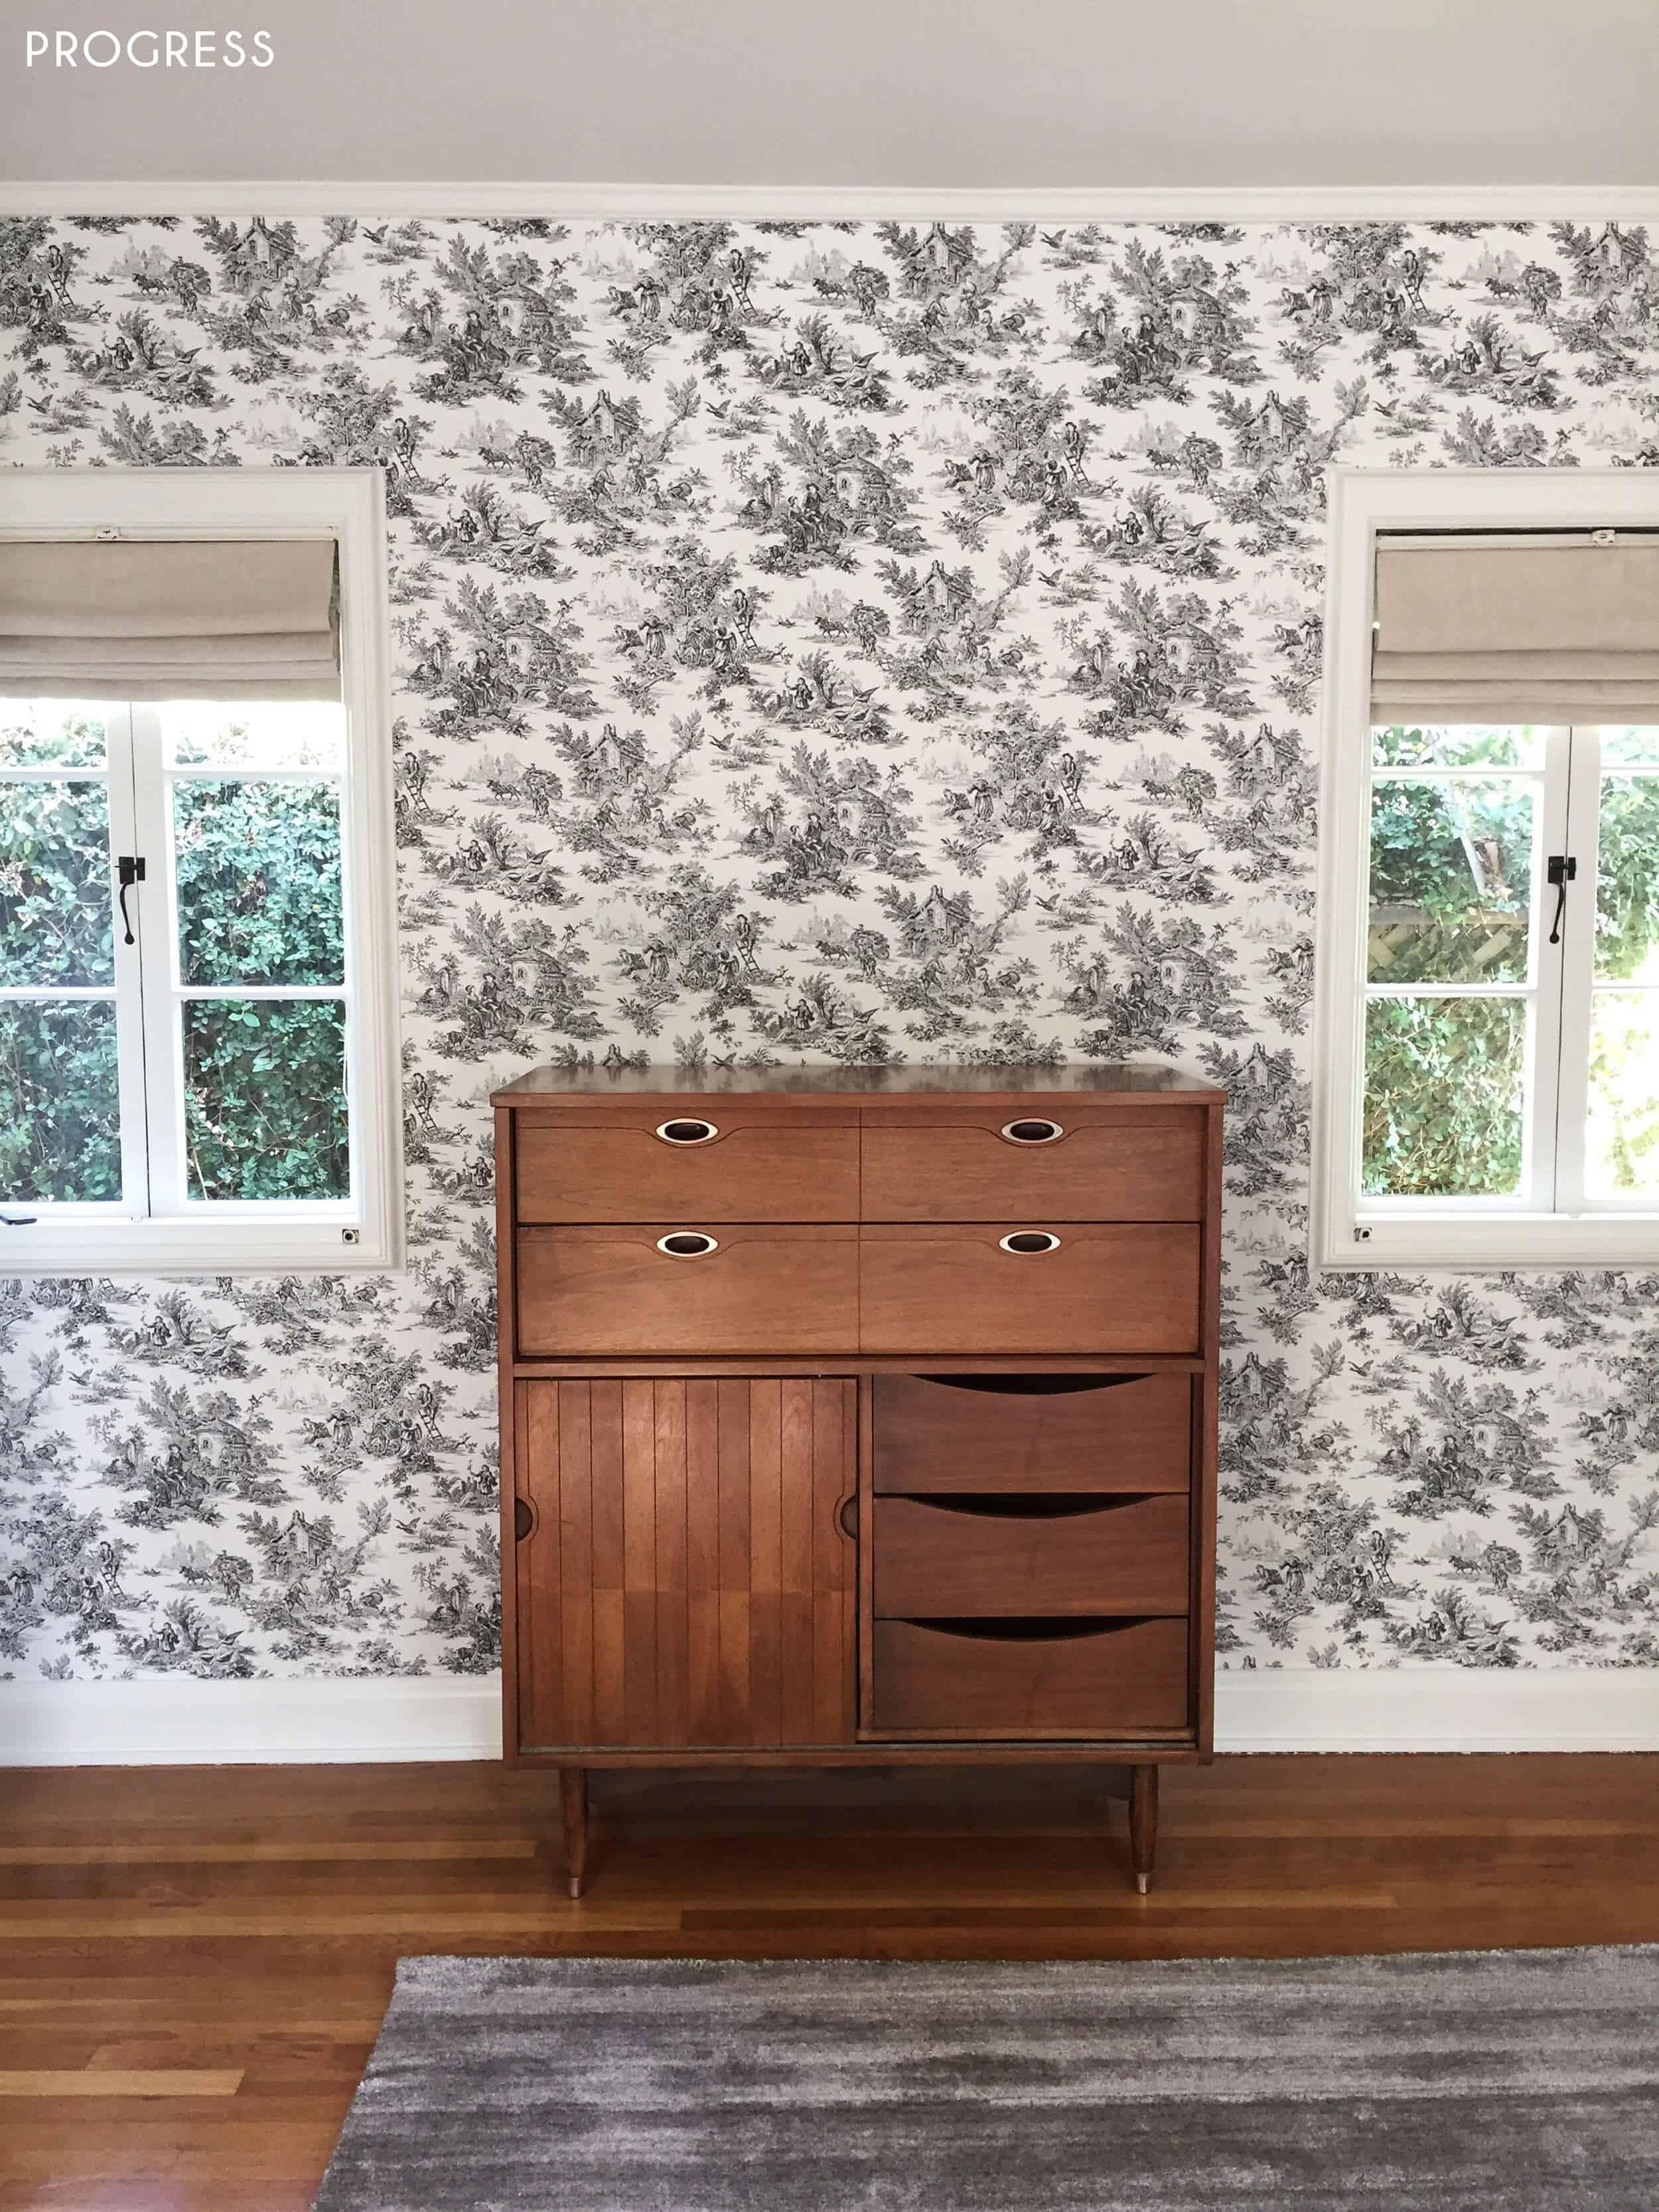 Guest Bedroom_Traditional Eclectic_Industrial_Modern_Toile_Wallpaper_Progress